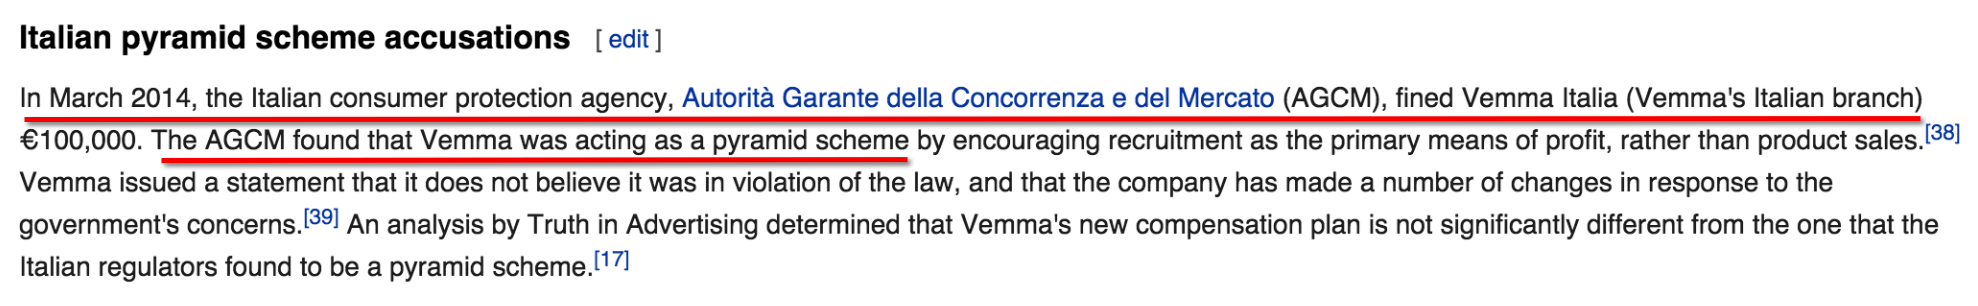 italian-accusation